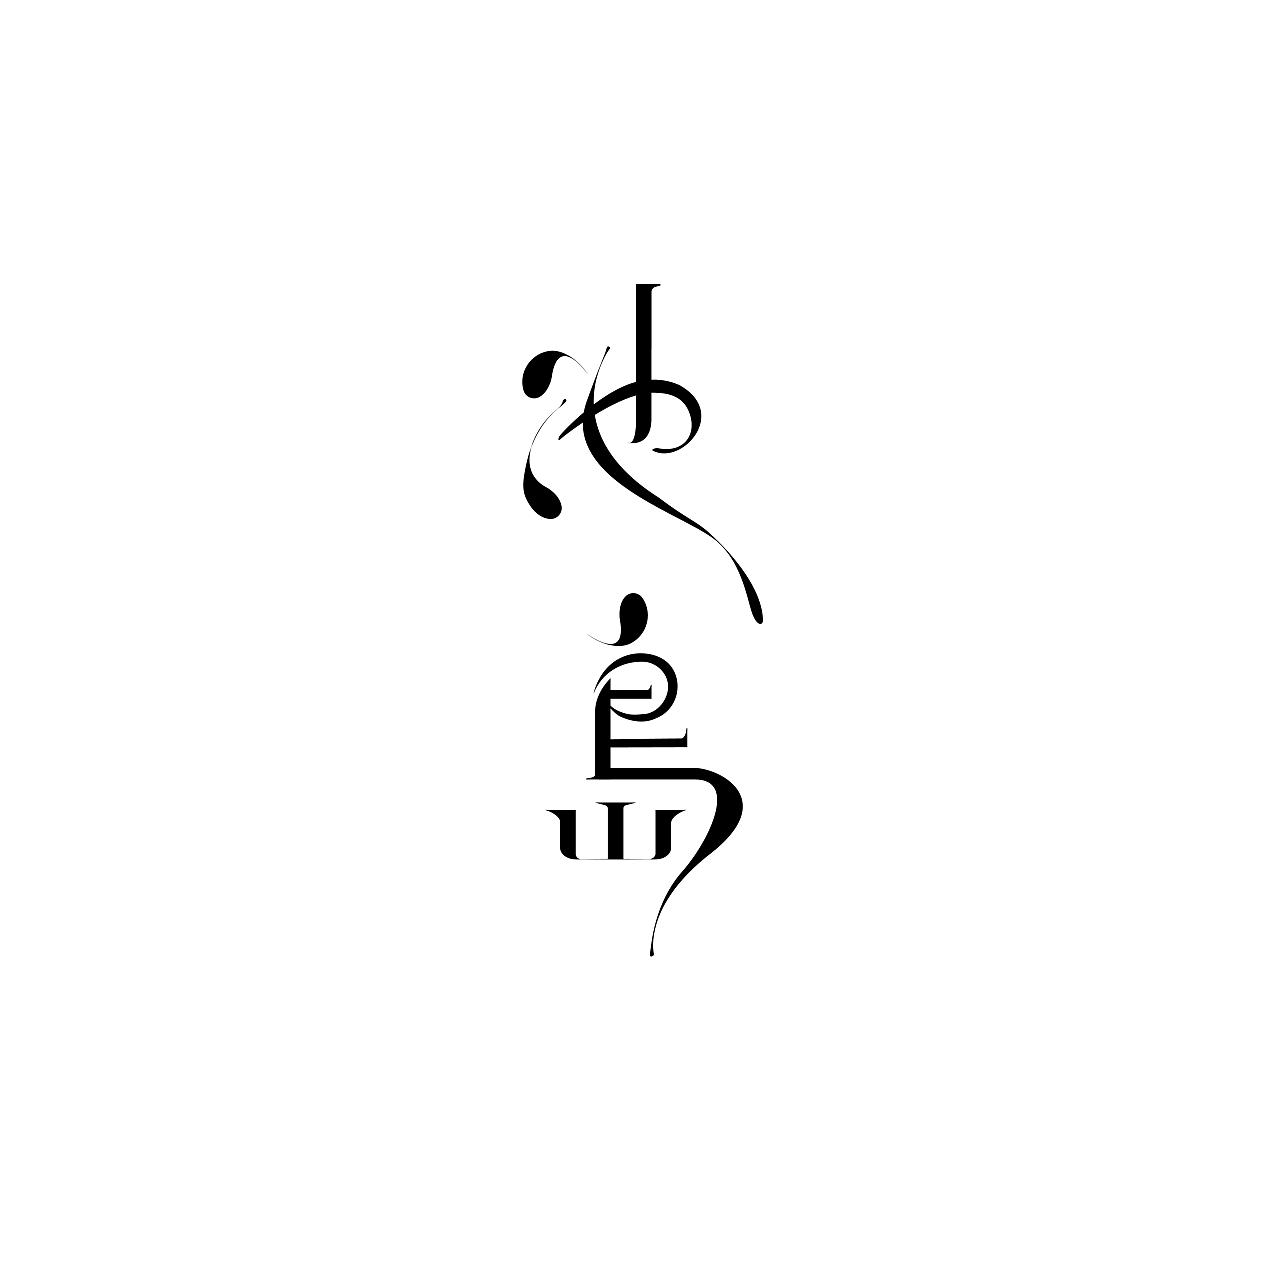 chinesefontdesign.com 2017 10 11 13 19 21 189934 16P Creative Chinese font logo design scheme #.38